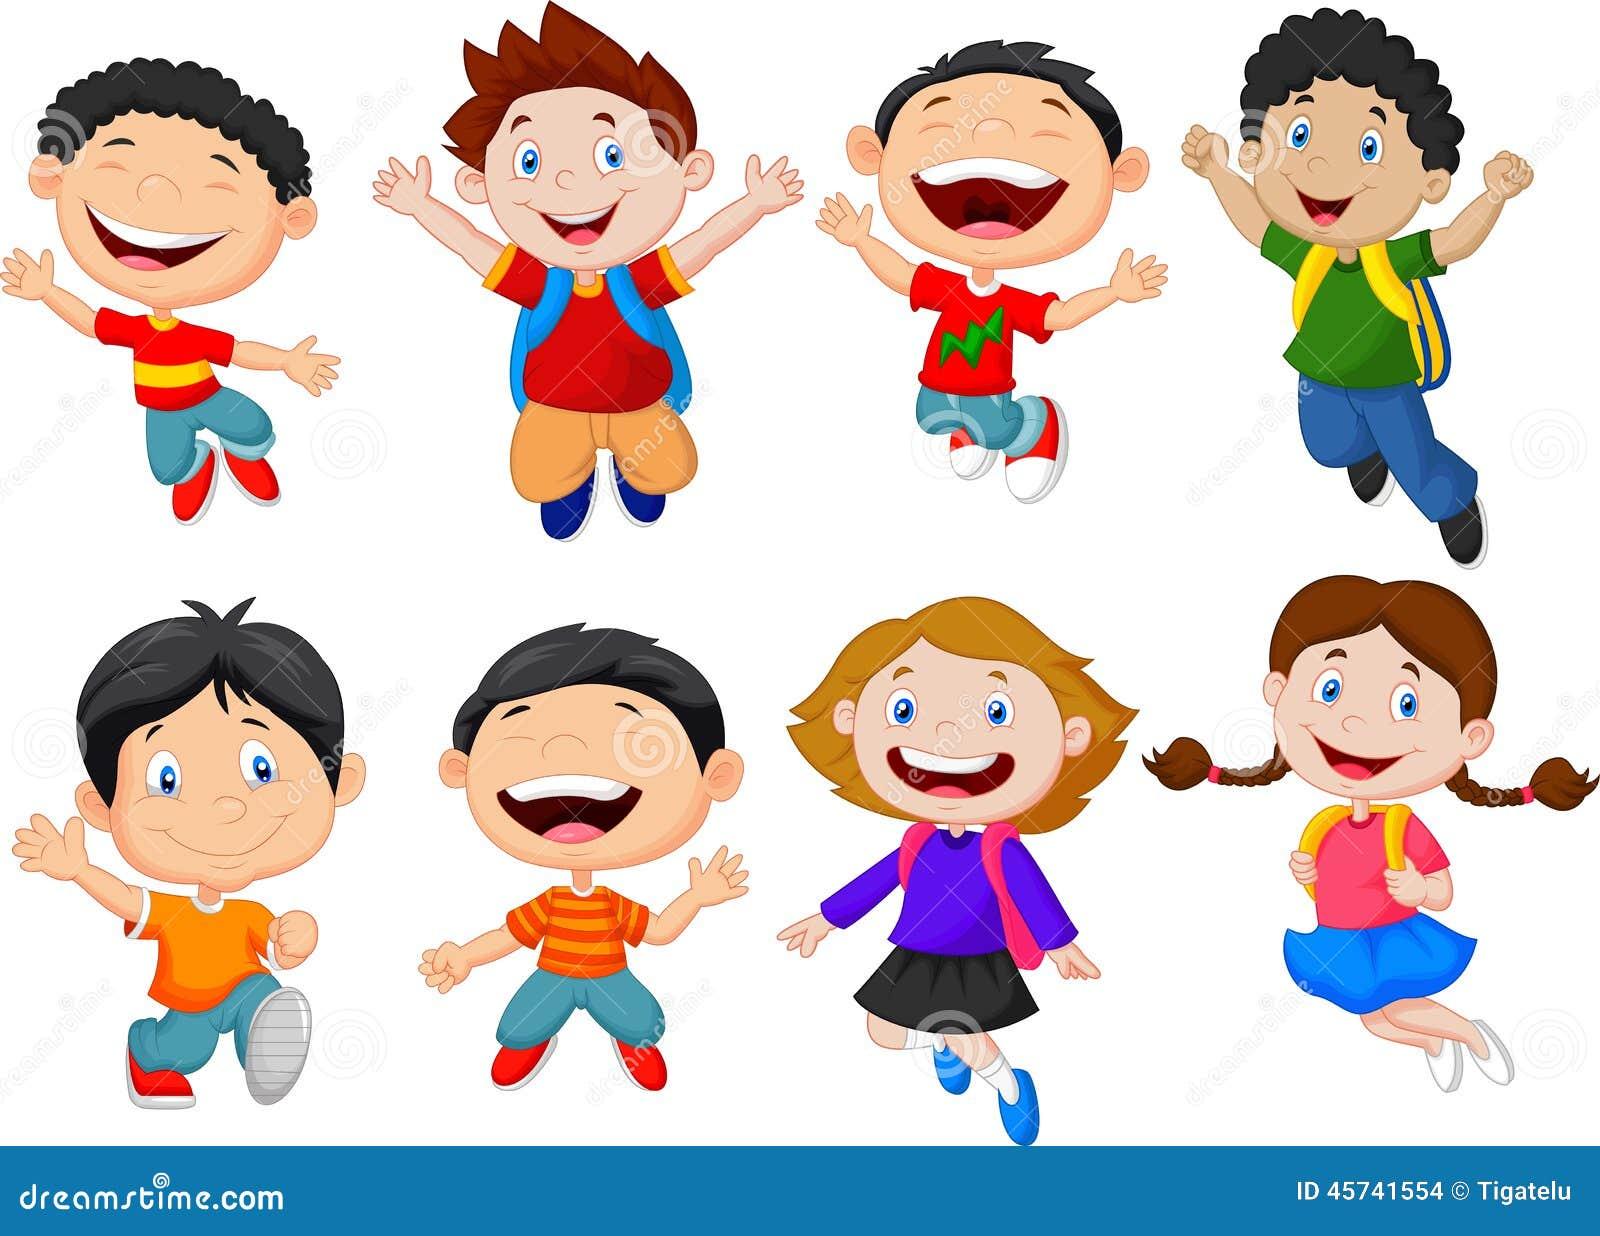 Happy kids cartoon stock vector. Illustration of isolated ...